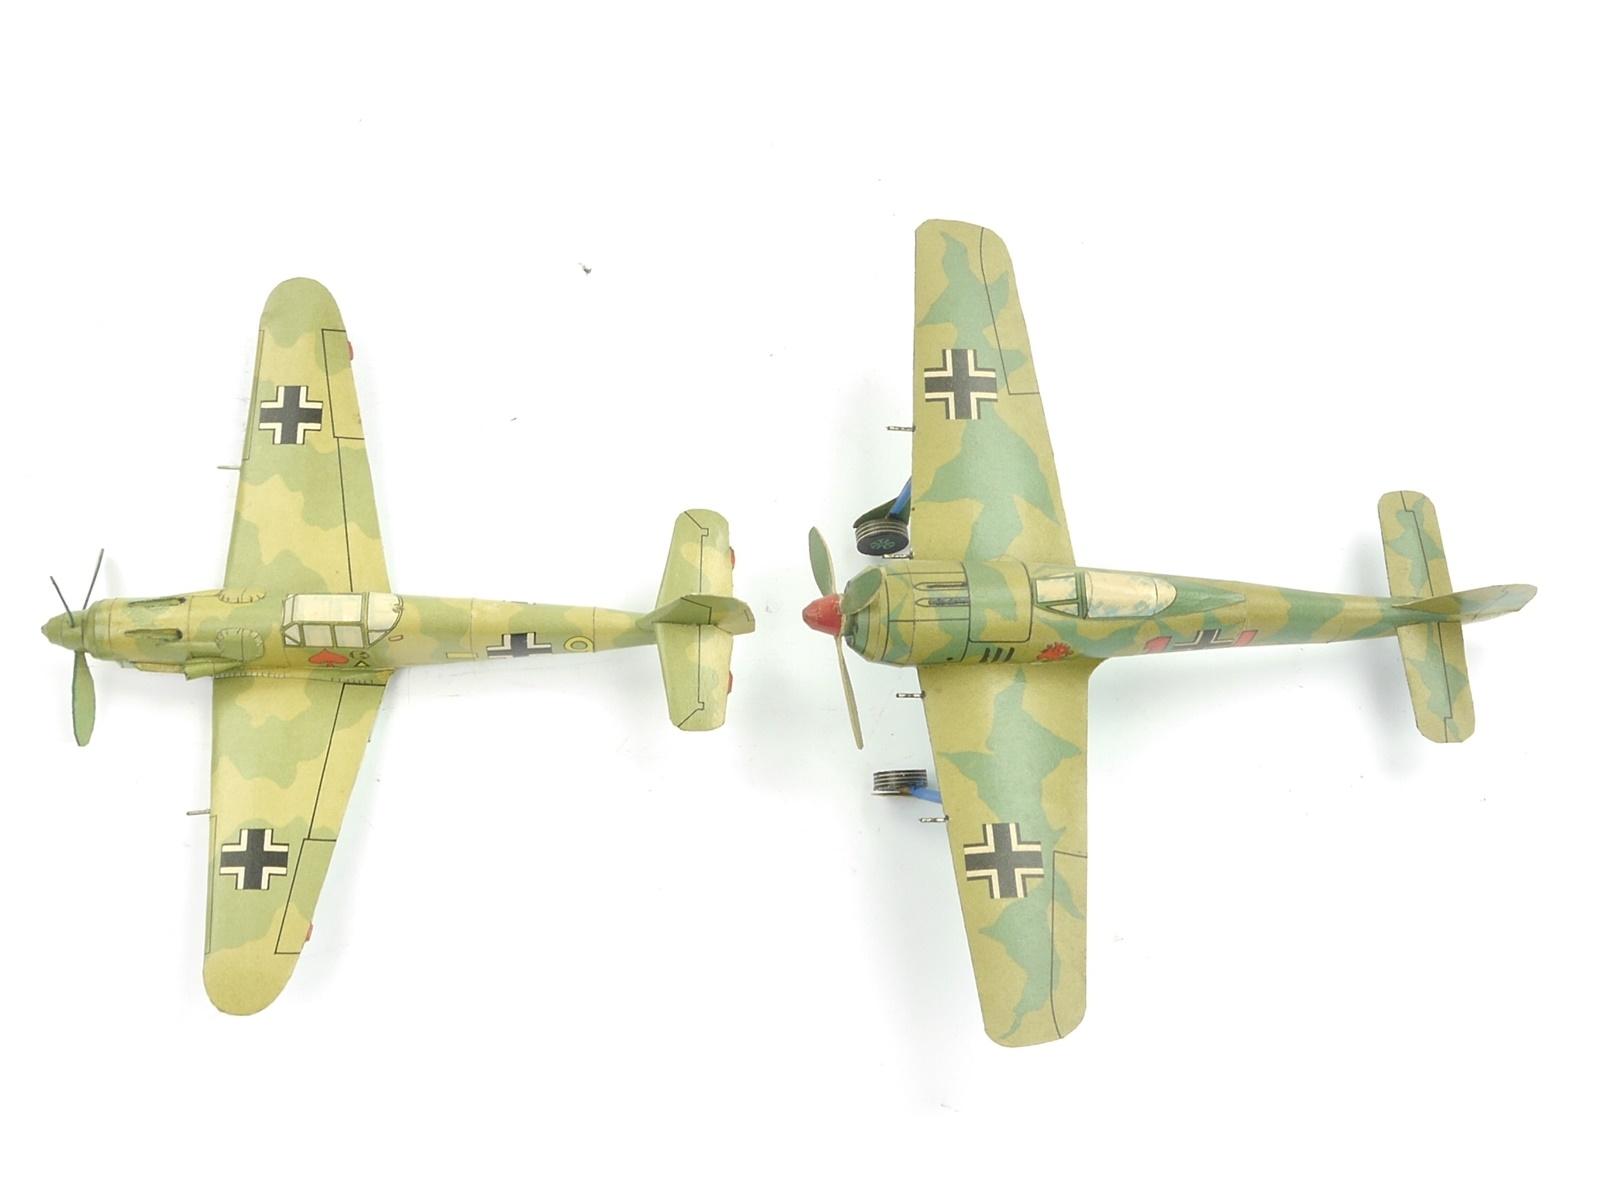 E62 Wilhelshavener Modell 2x Modellflugzeug Pappmodell Papiermodell Militär